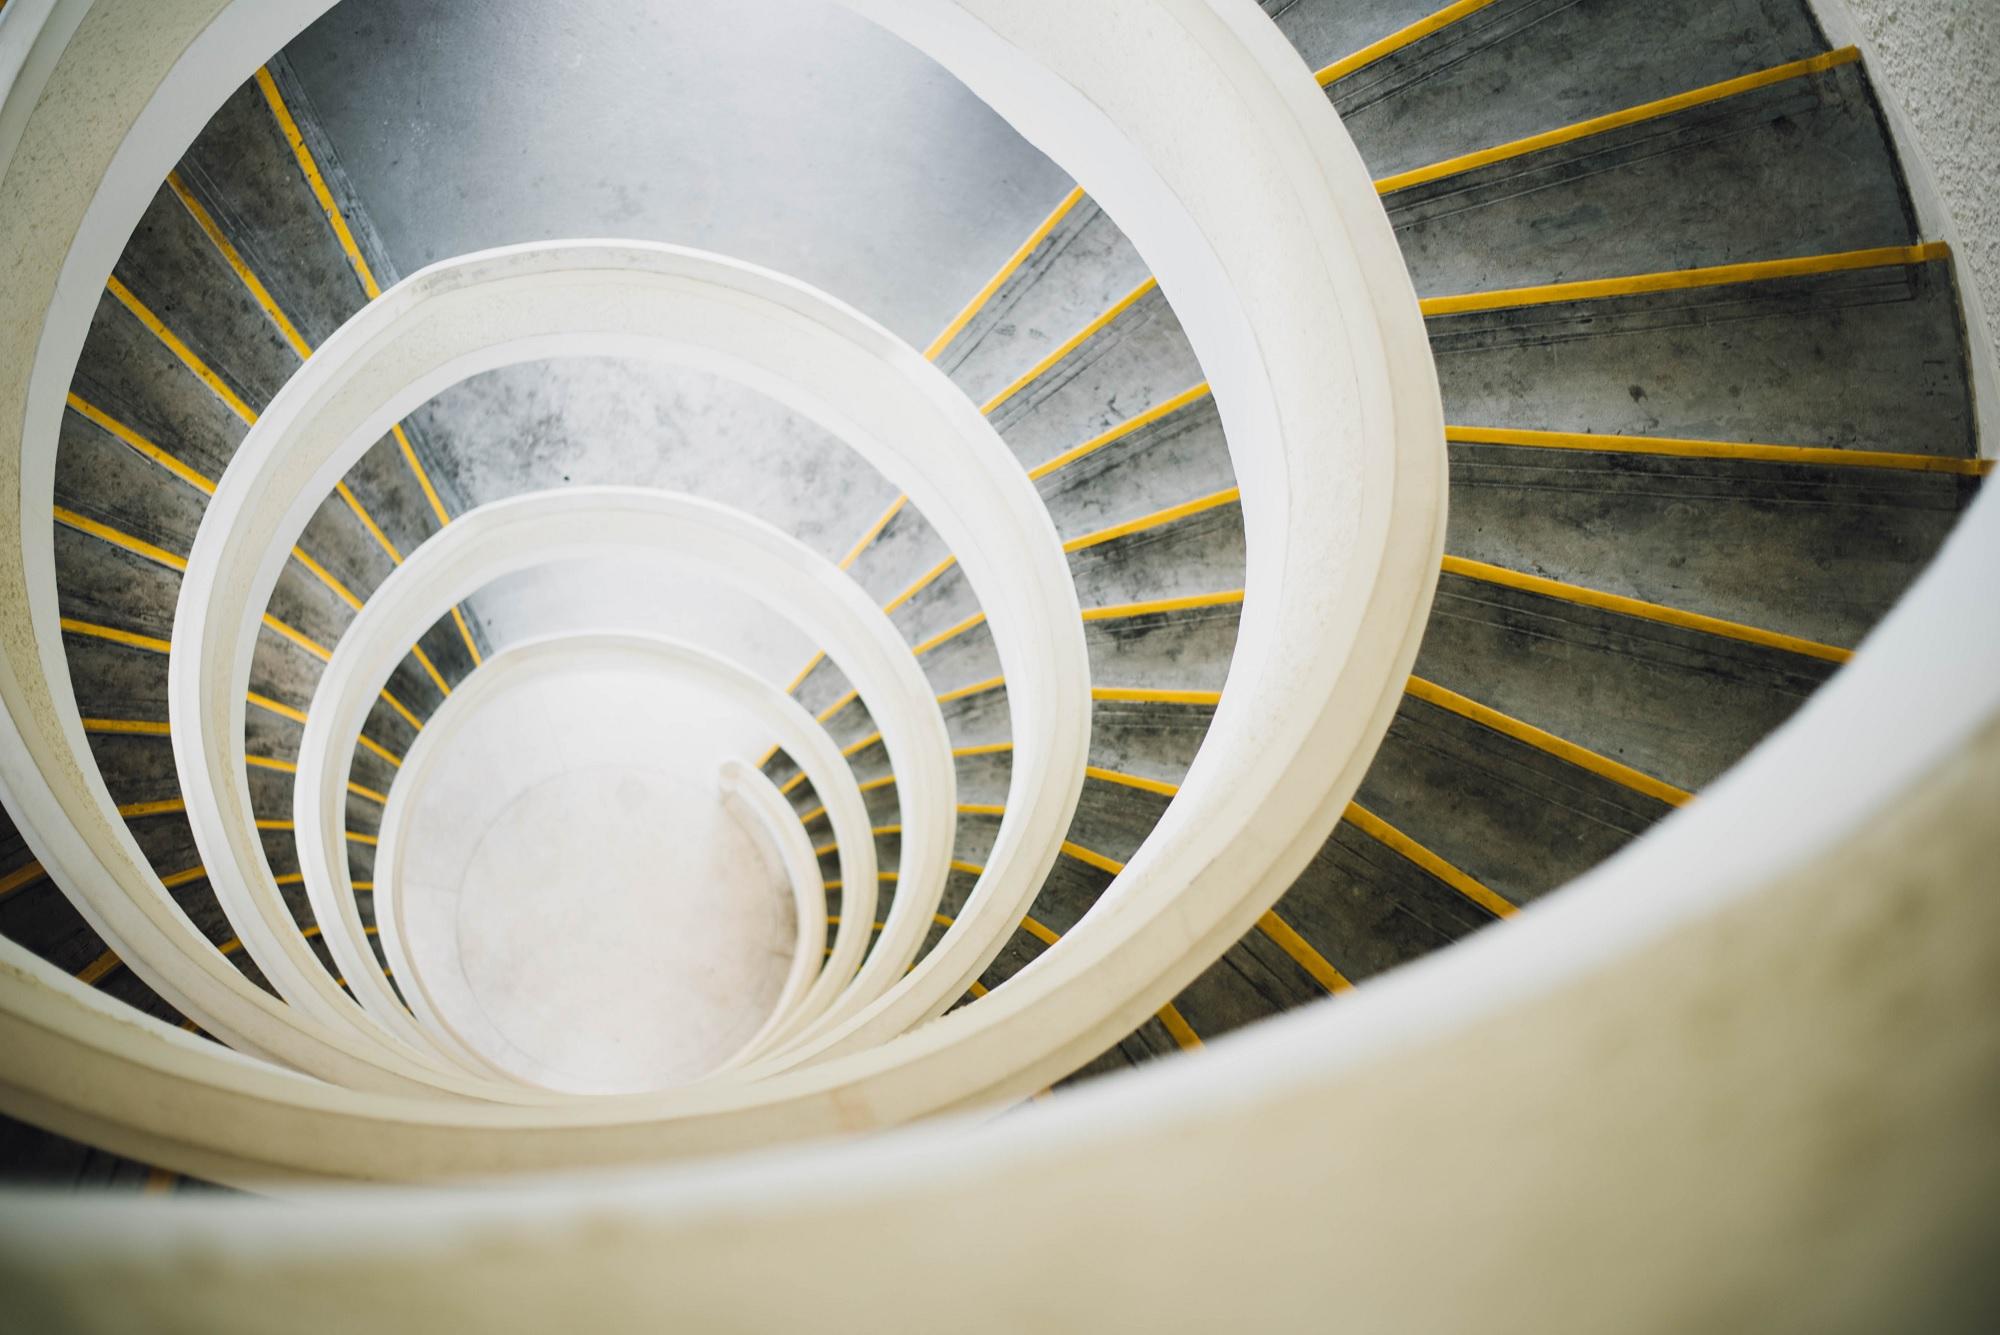 stairs_2_mod.jpg